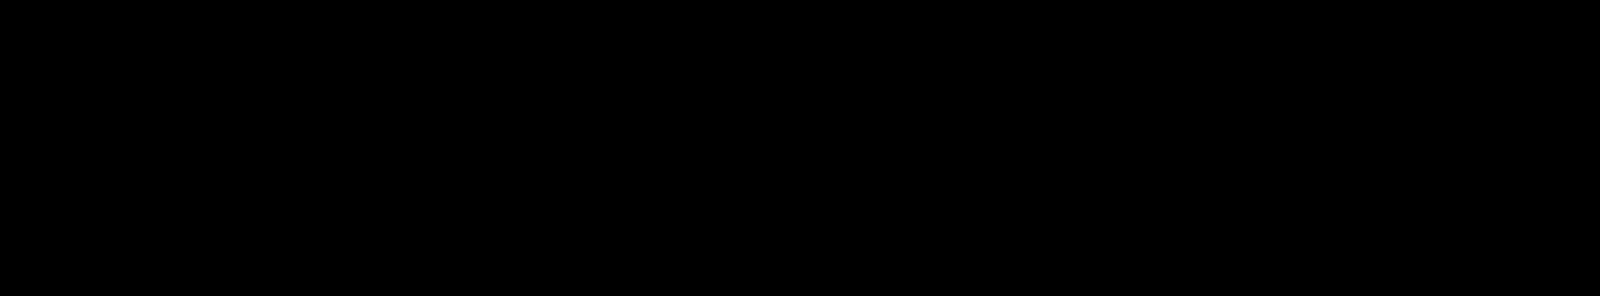 image21.png